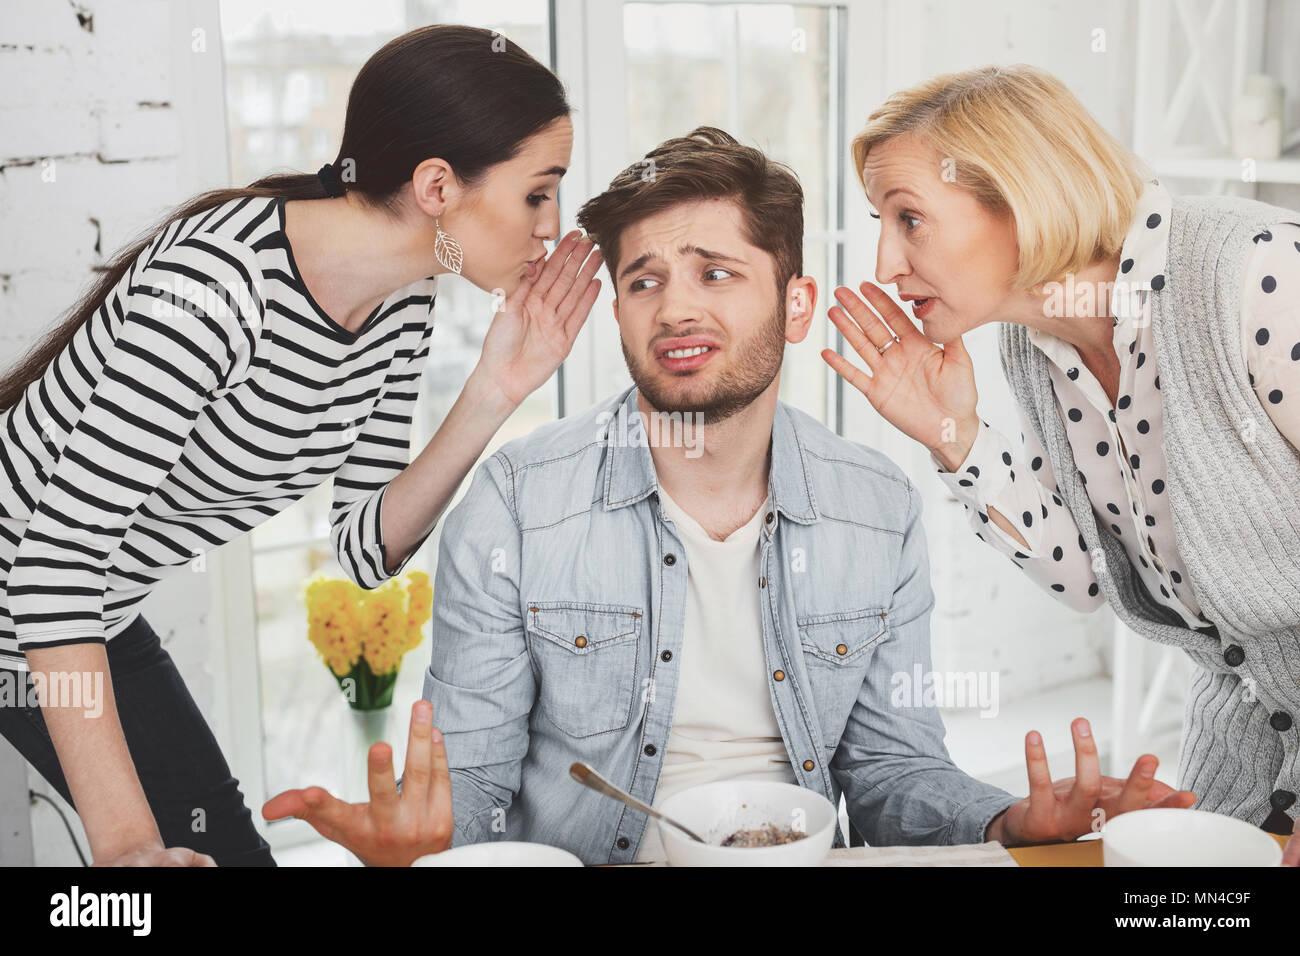 Cheerless young man listening to women - Stock Image